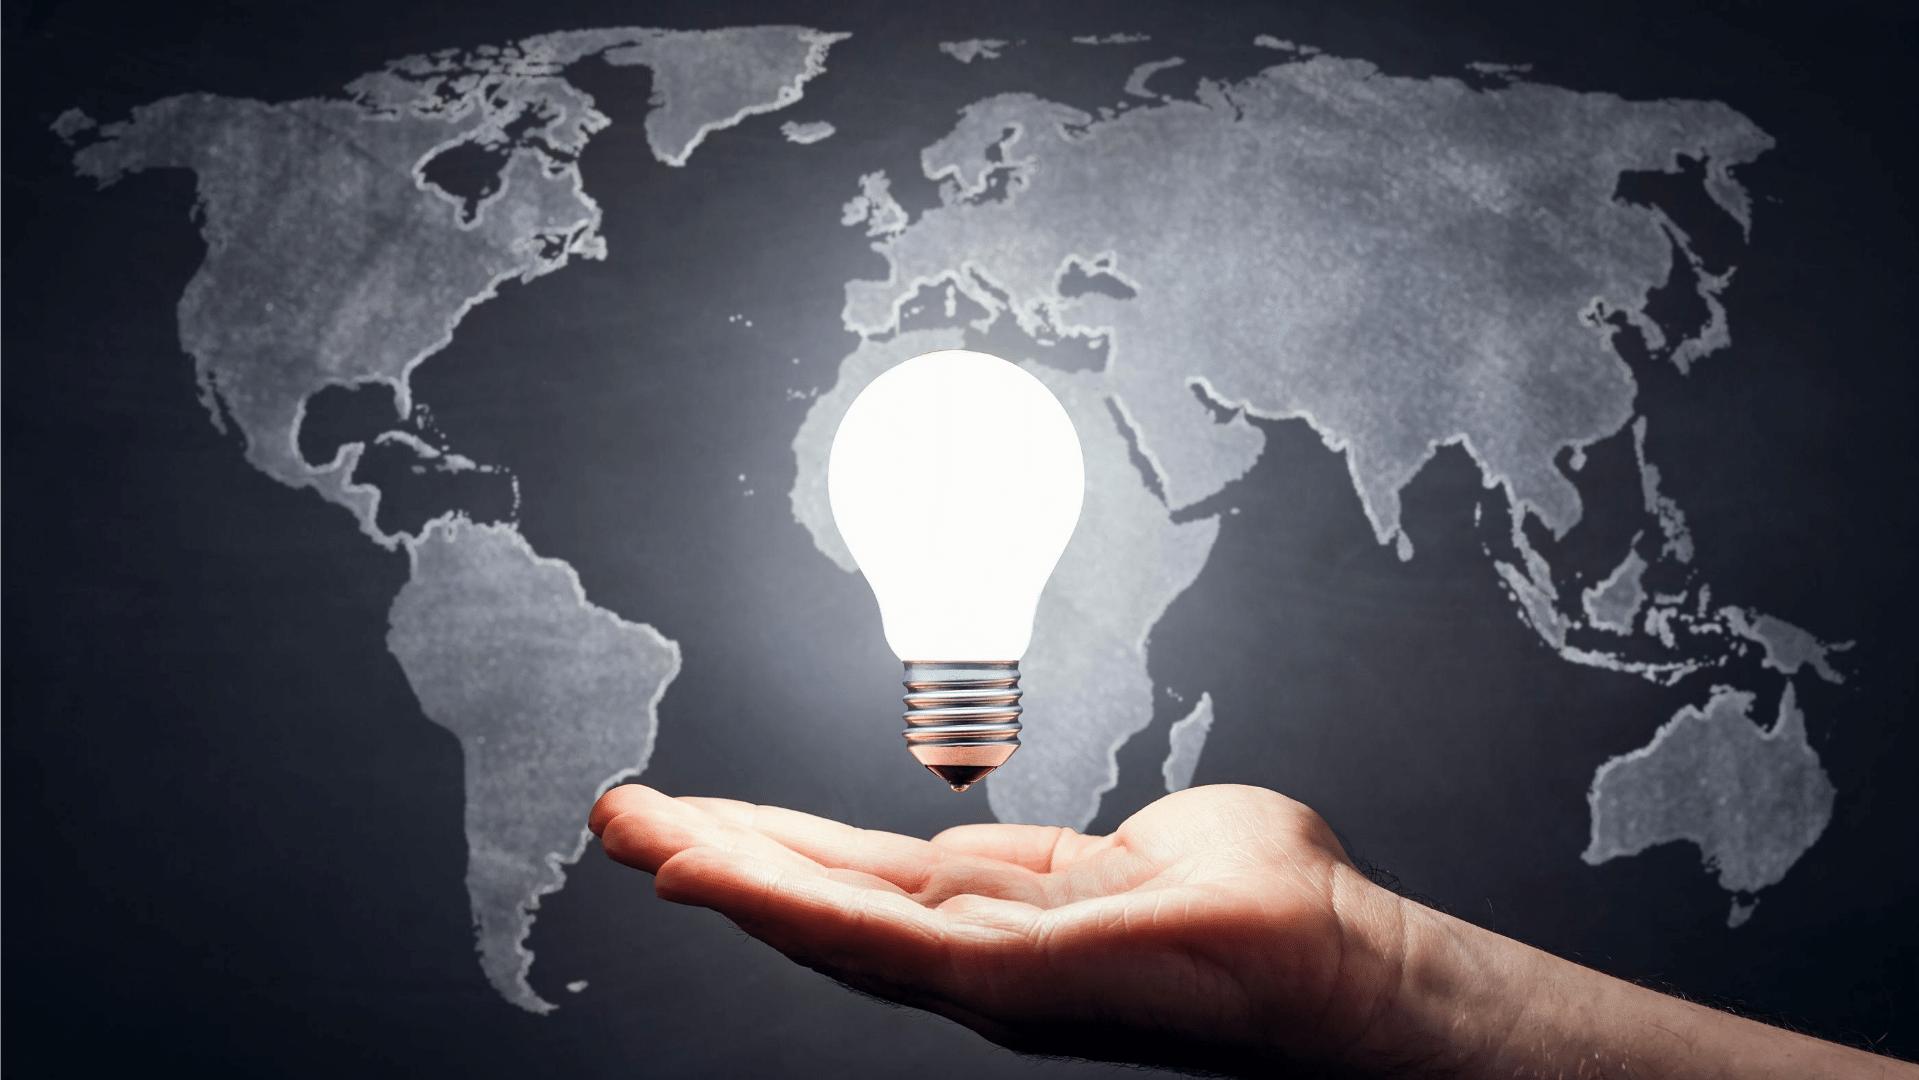 world map lit lightbulb above open palm